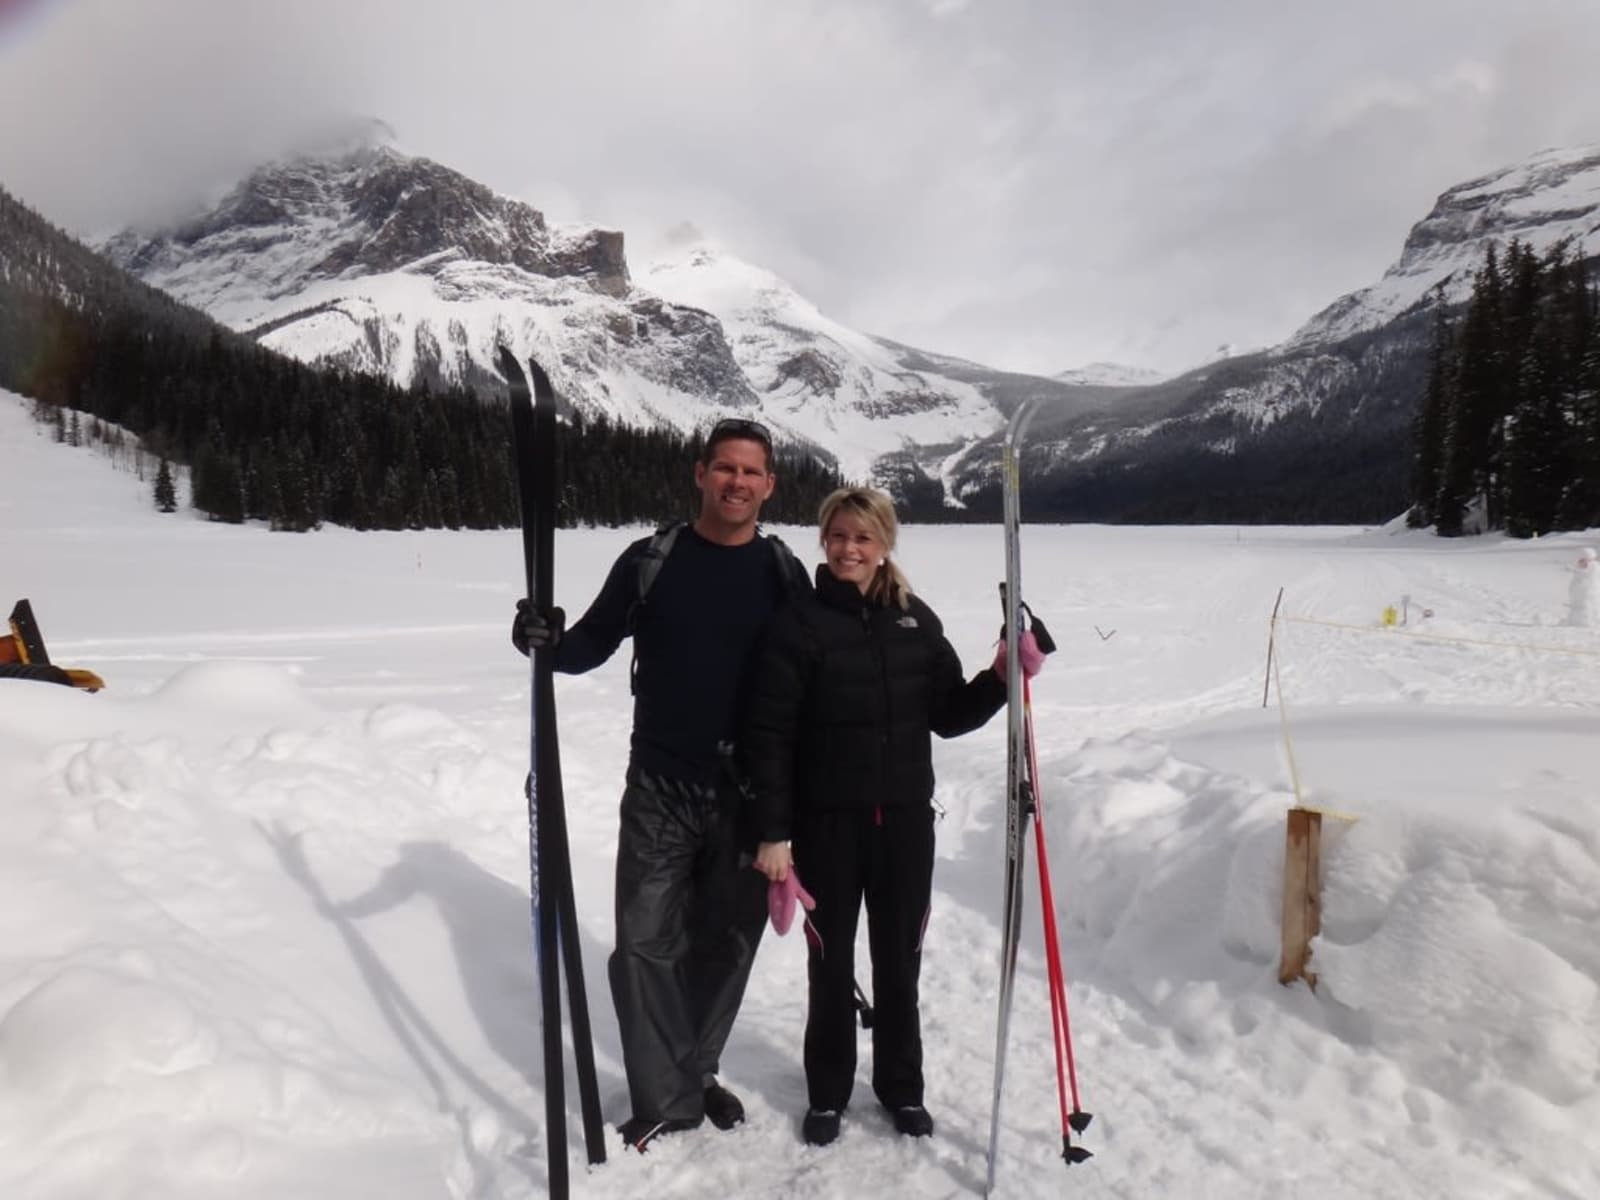 Robert & Justine from Calgary, Alberta, Canada